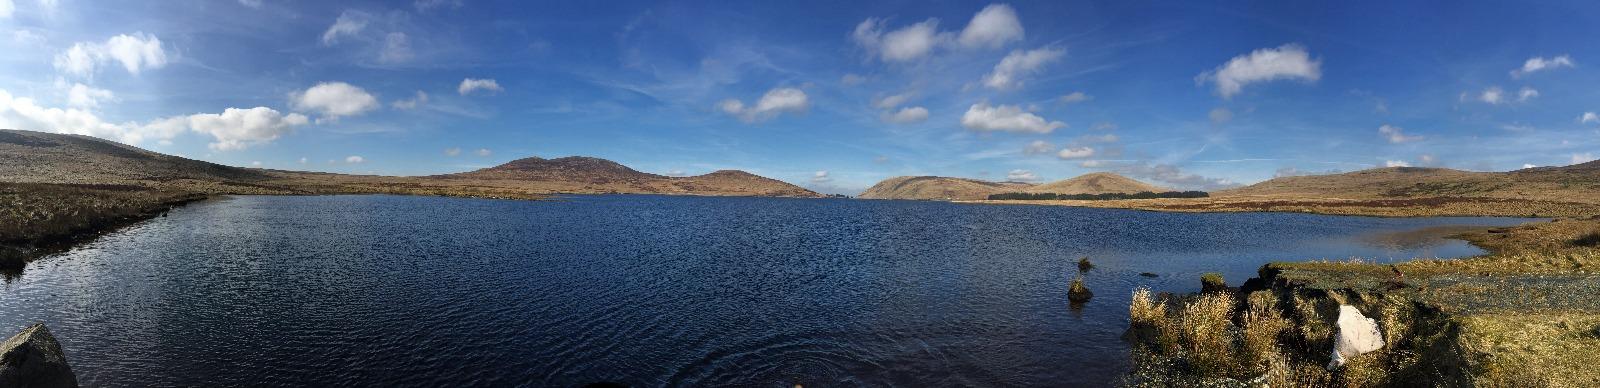 beautiful_panoramic_spelga_damn_mourne_mountains_ni_explorer_niexplorer_northern_ireland_blog.jpg